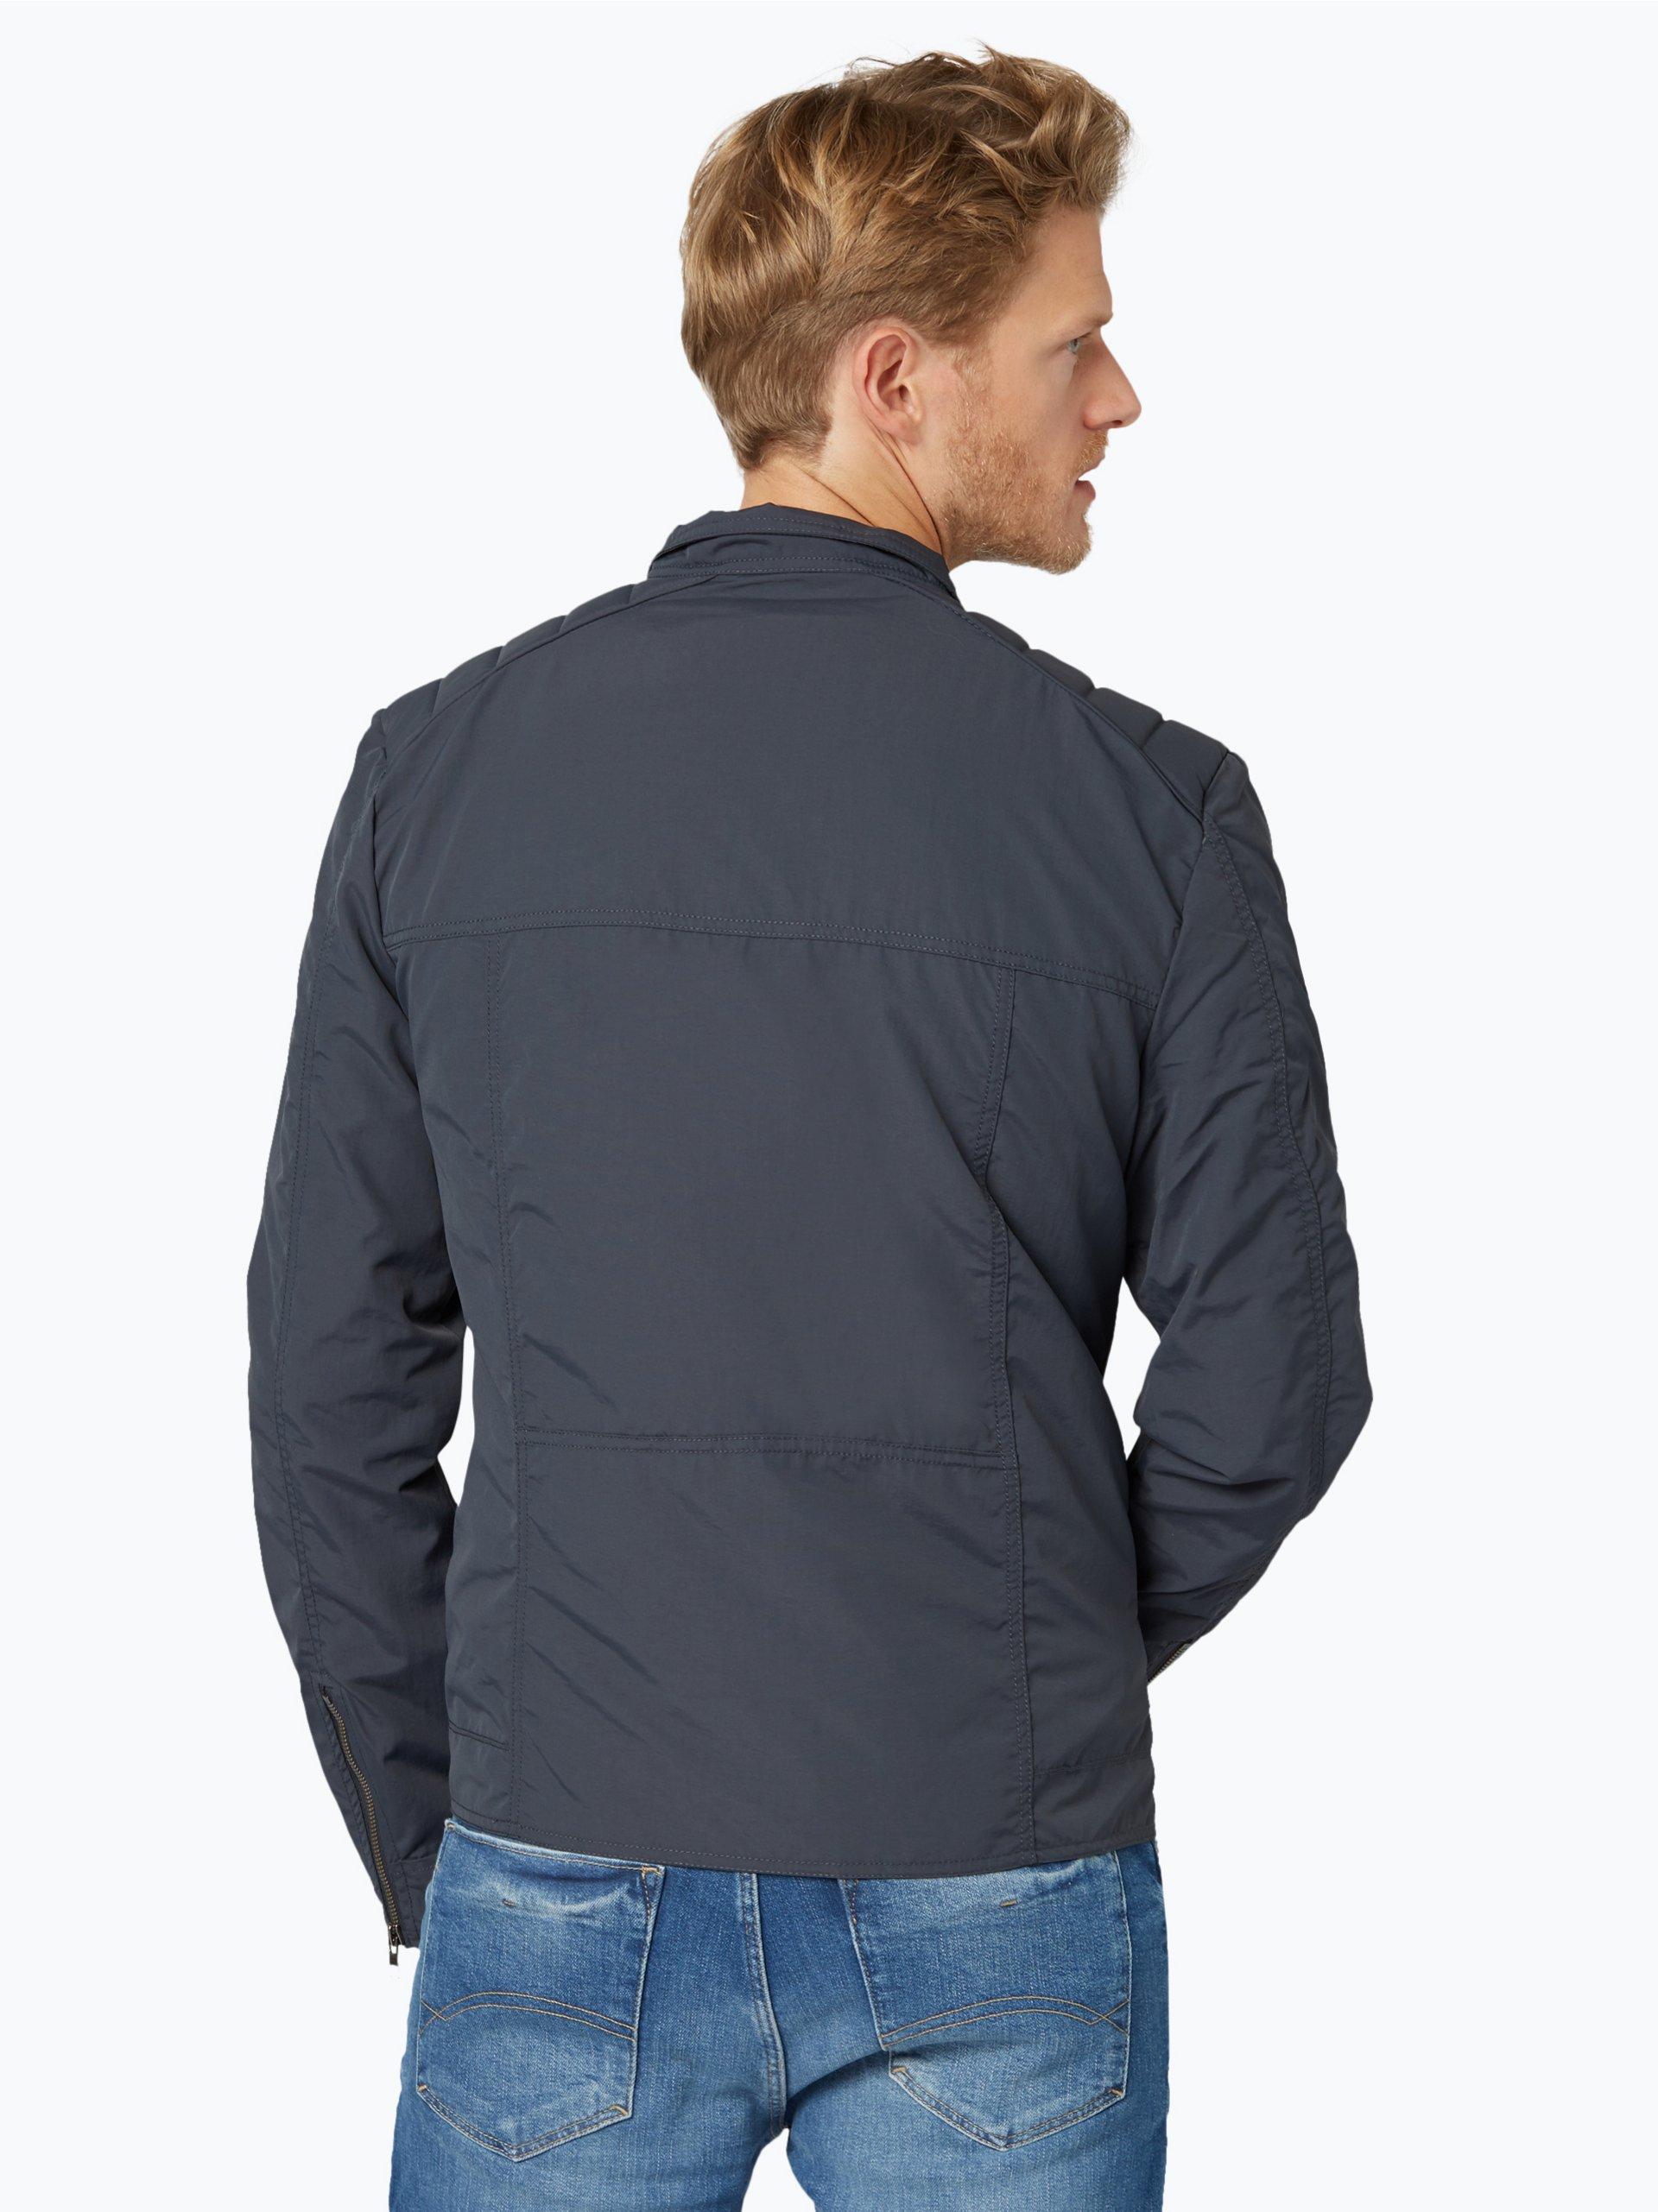 tommy jeans herren jacke grau uni online kaufen peek und. Black Bedroom Furniture Sets. Home Design Ideas